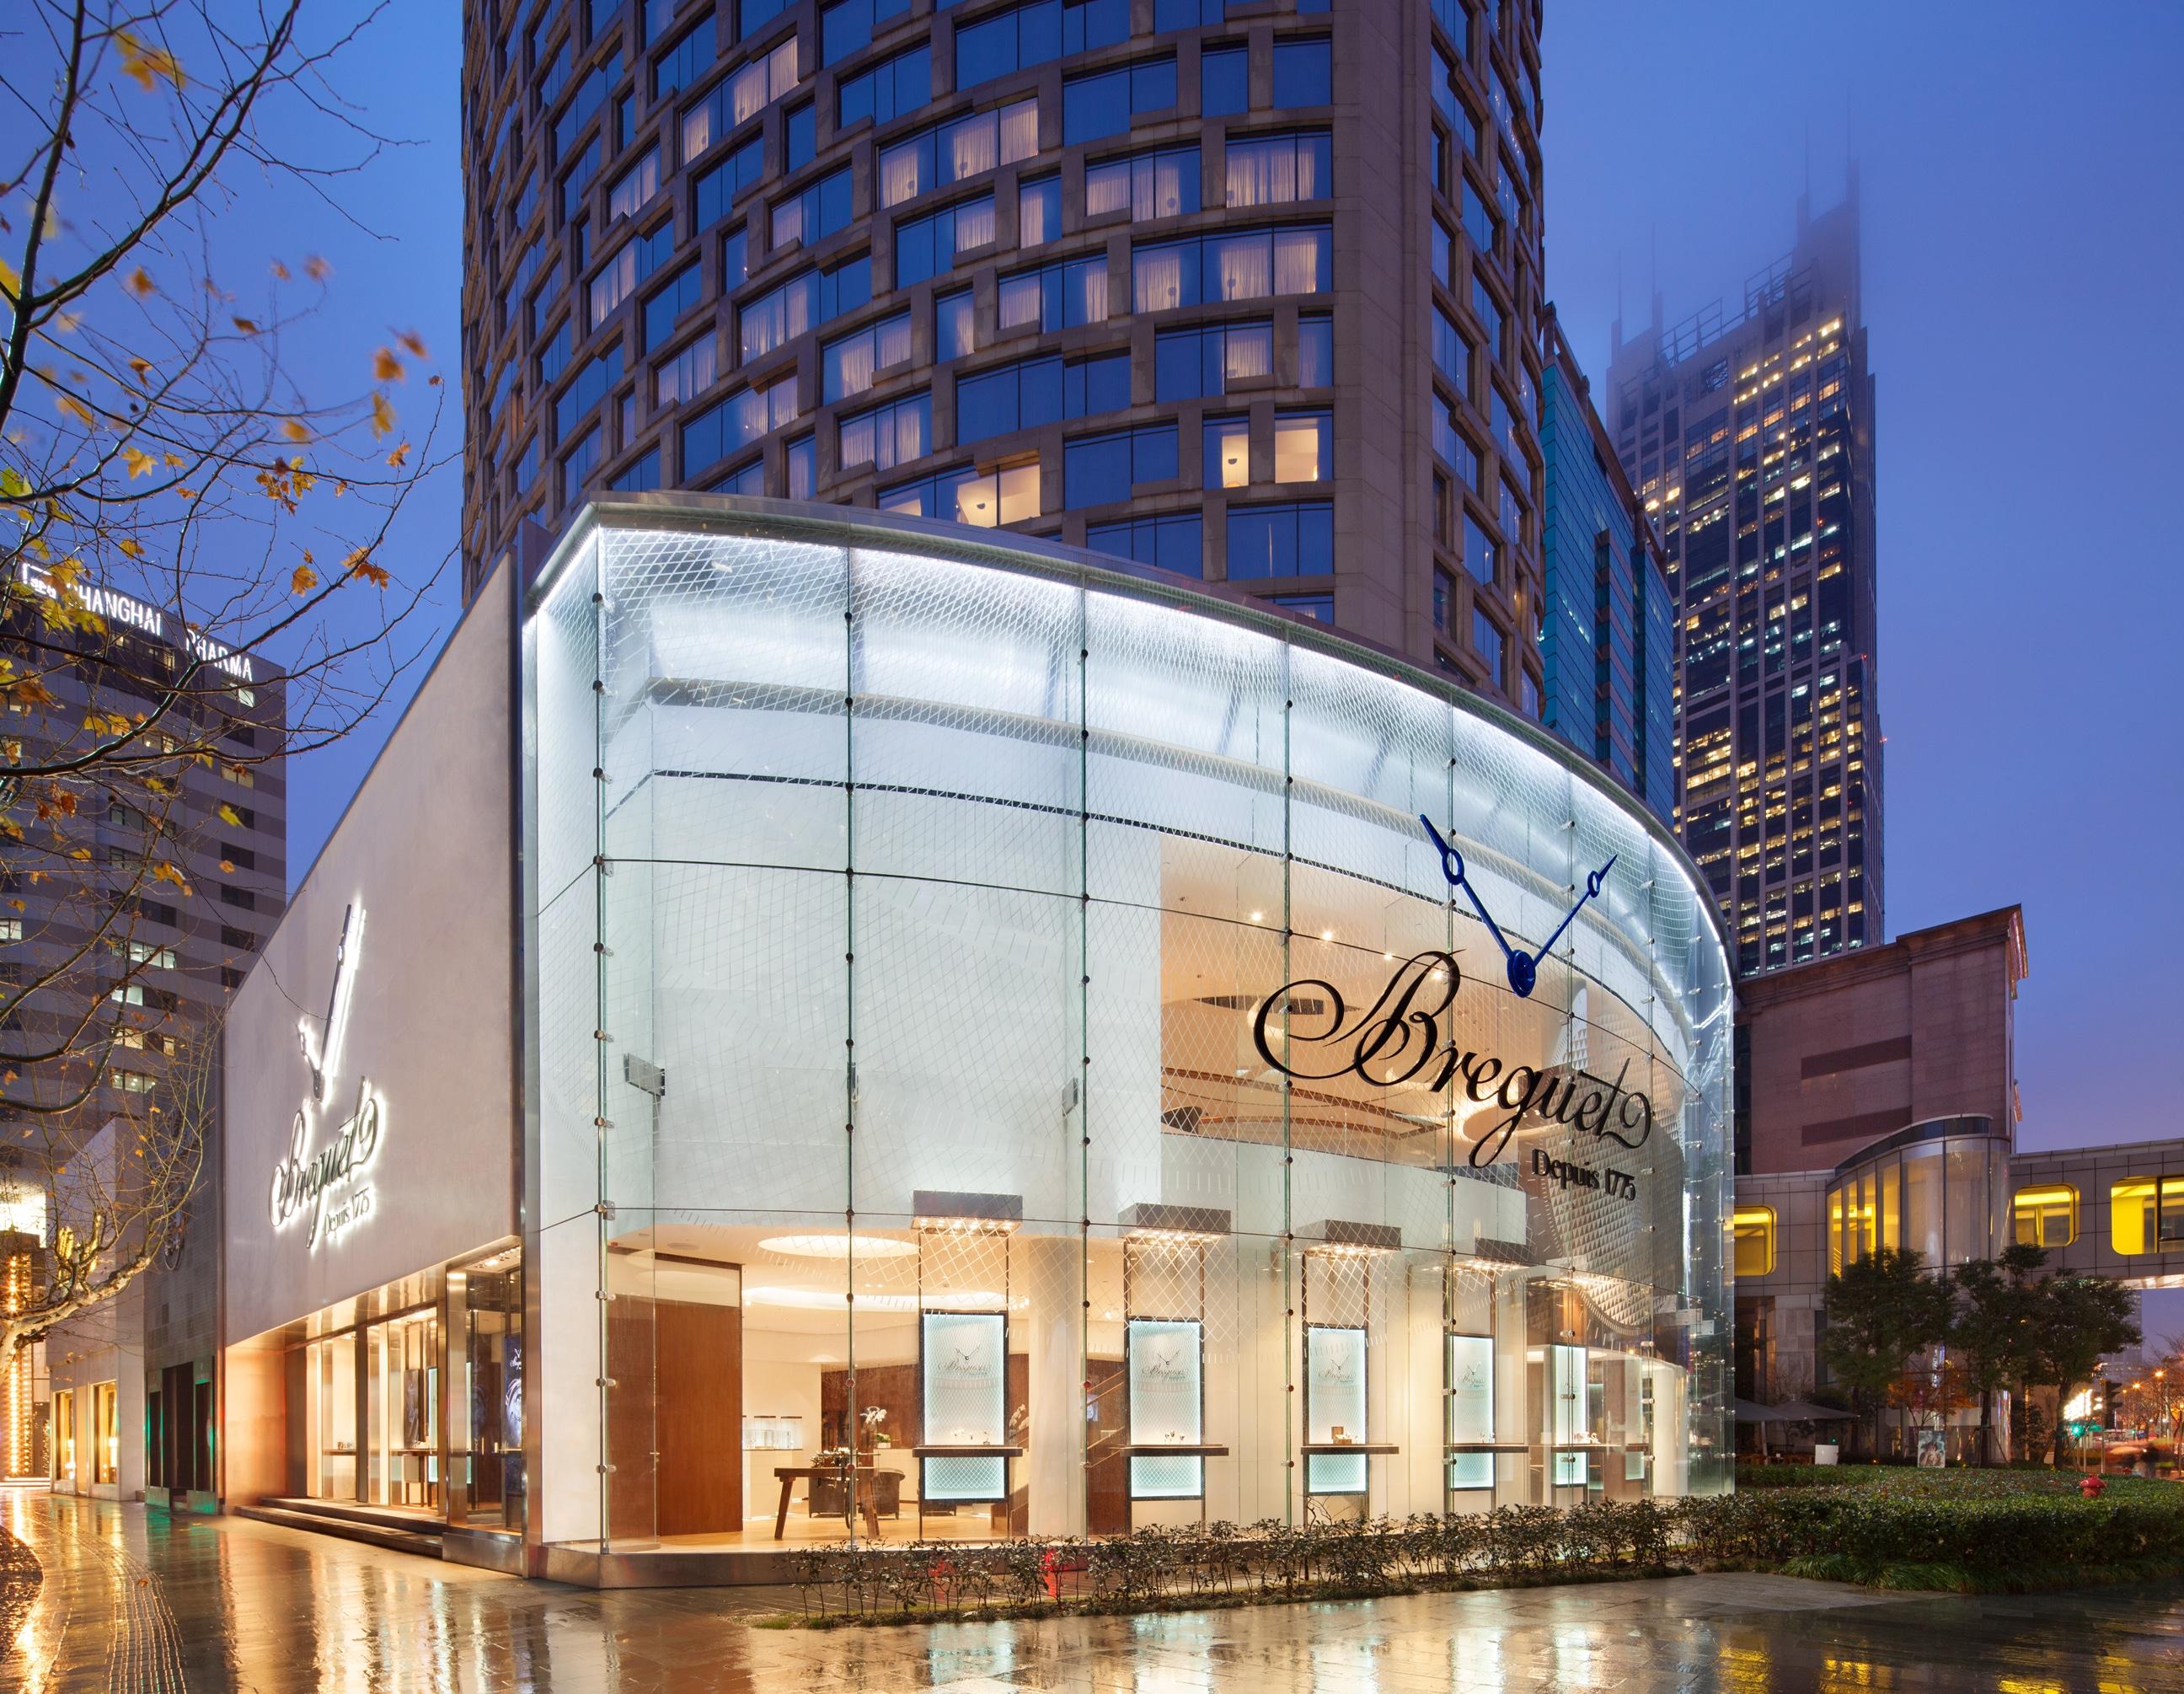 Breguet-Boutique in Shanghai